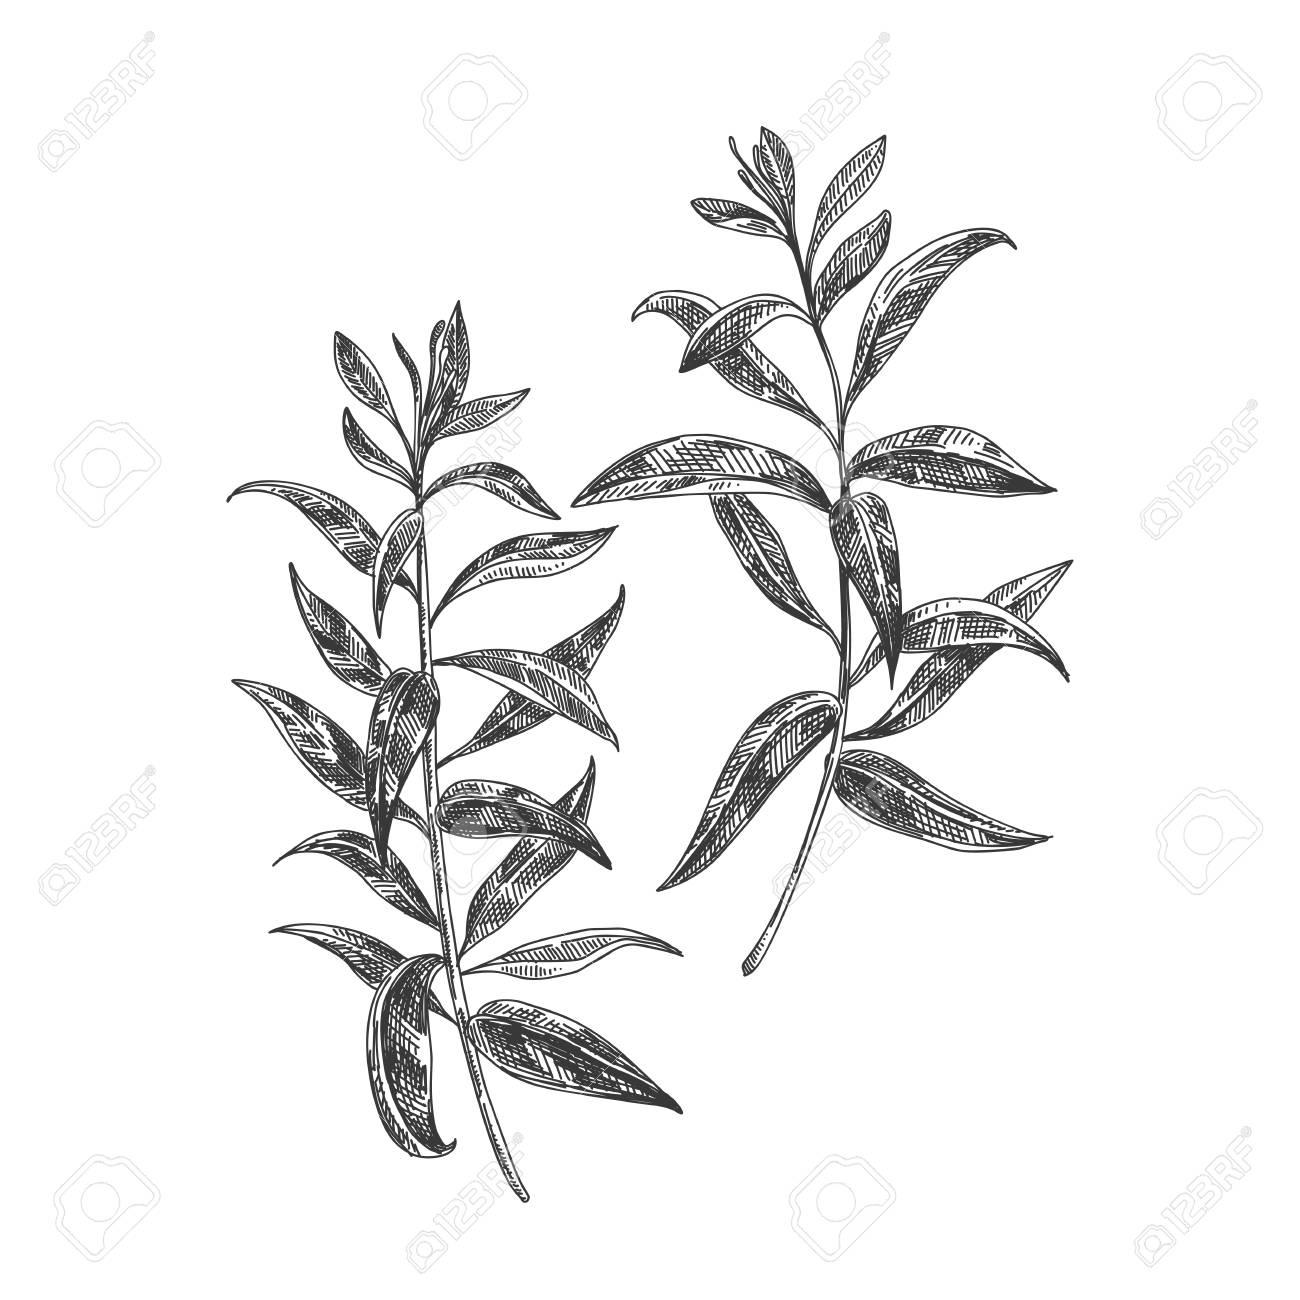 Beautiful vector hand drawn lemon verbena tea herb Illustration. Detailed retro style images. Vintage sketch element for labels, packaging and cards design. - 94854881